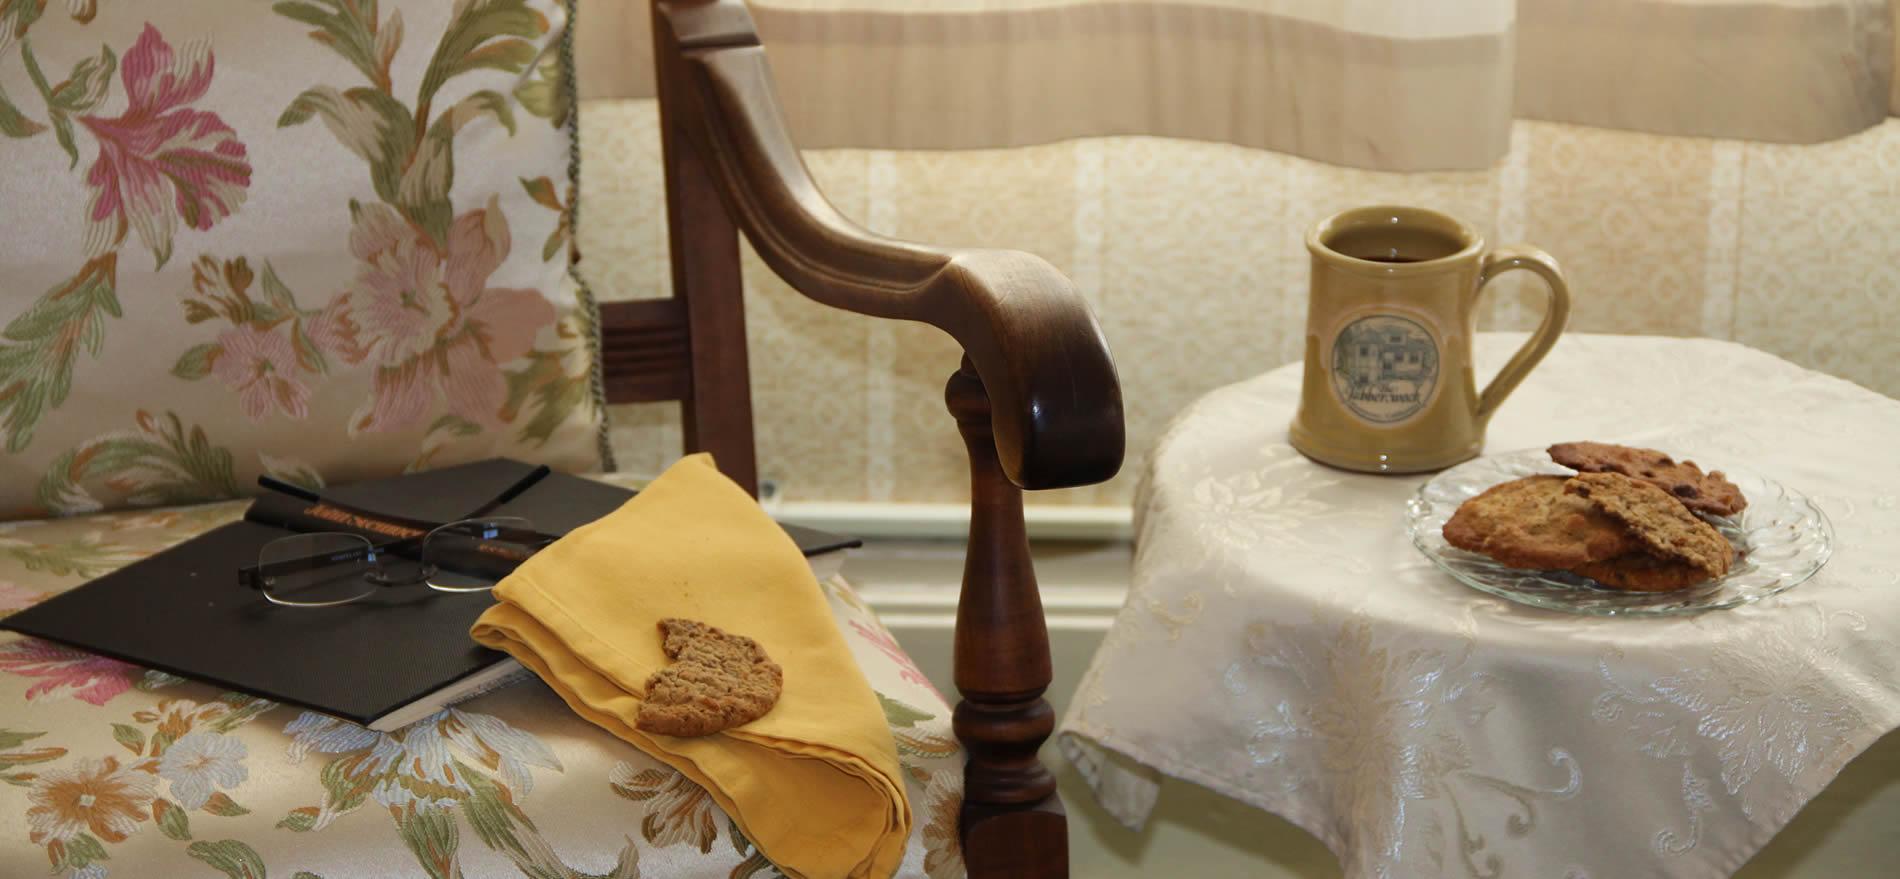 monterey bed and breakfast tea and cookies